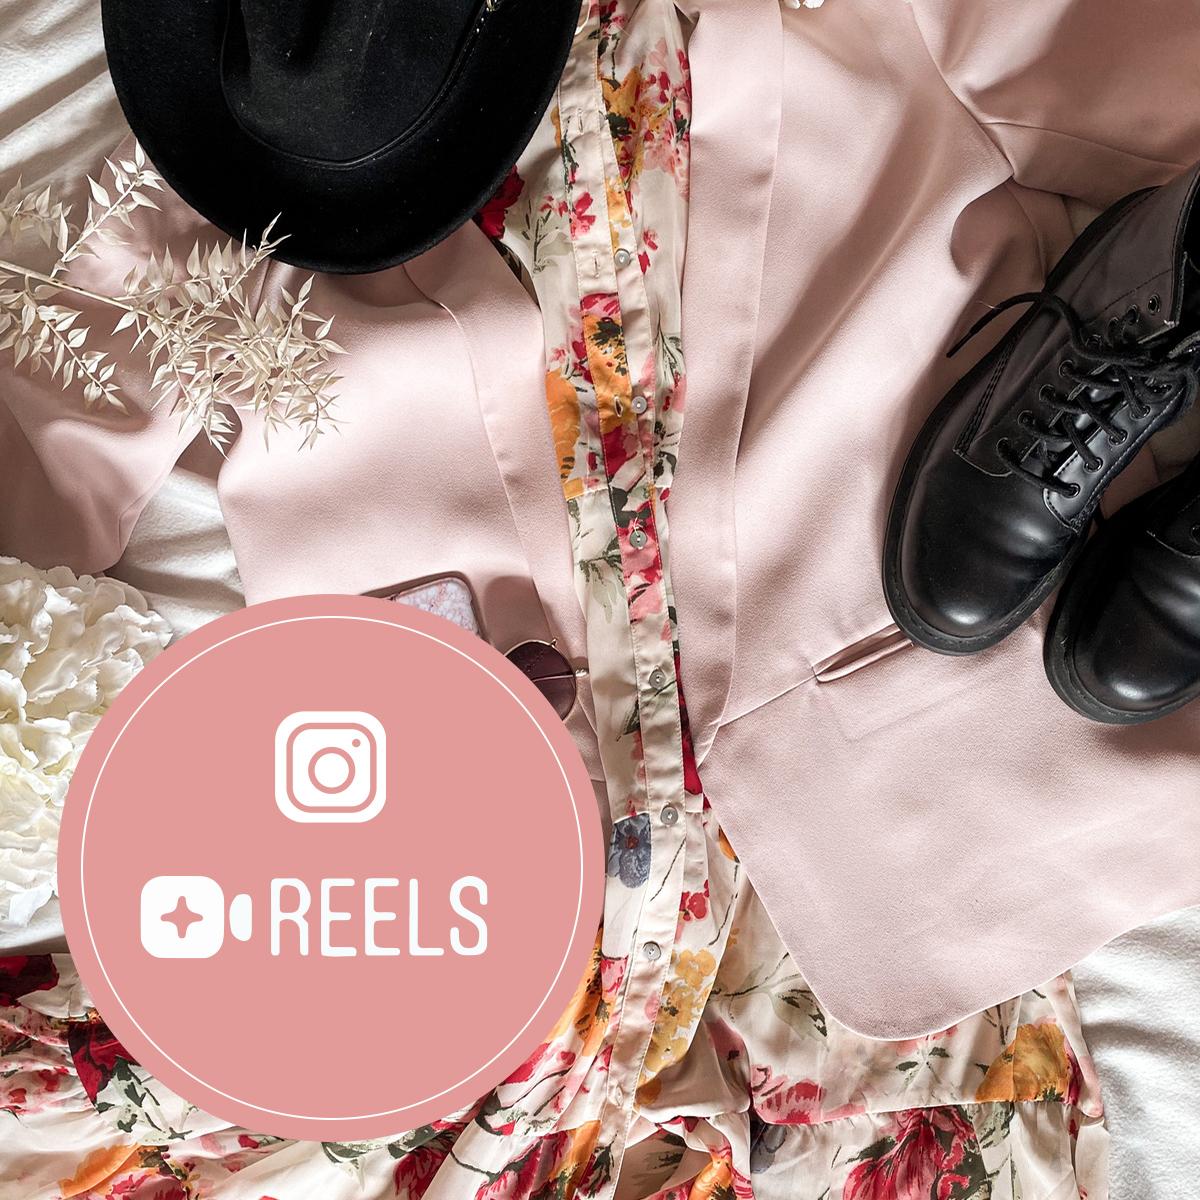 stylink, vergütungs-plattform, influencer, instagram geld verdienen, youtube geld verdienen, instagram reels